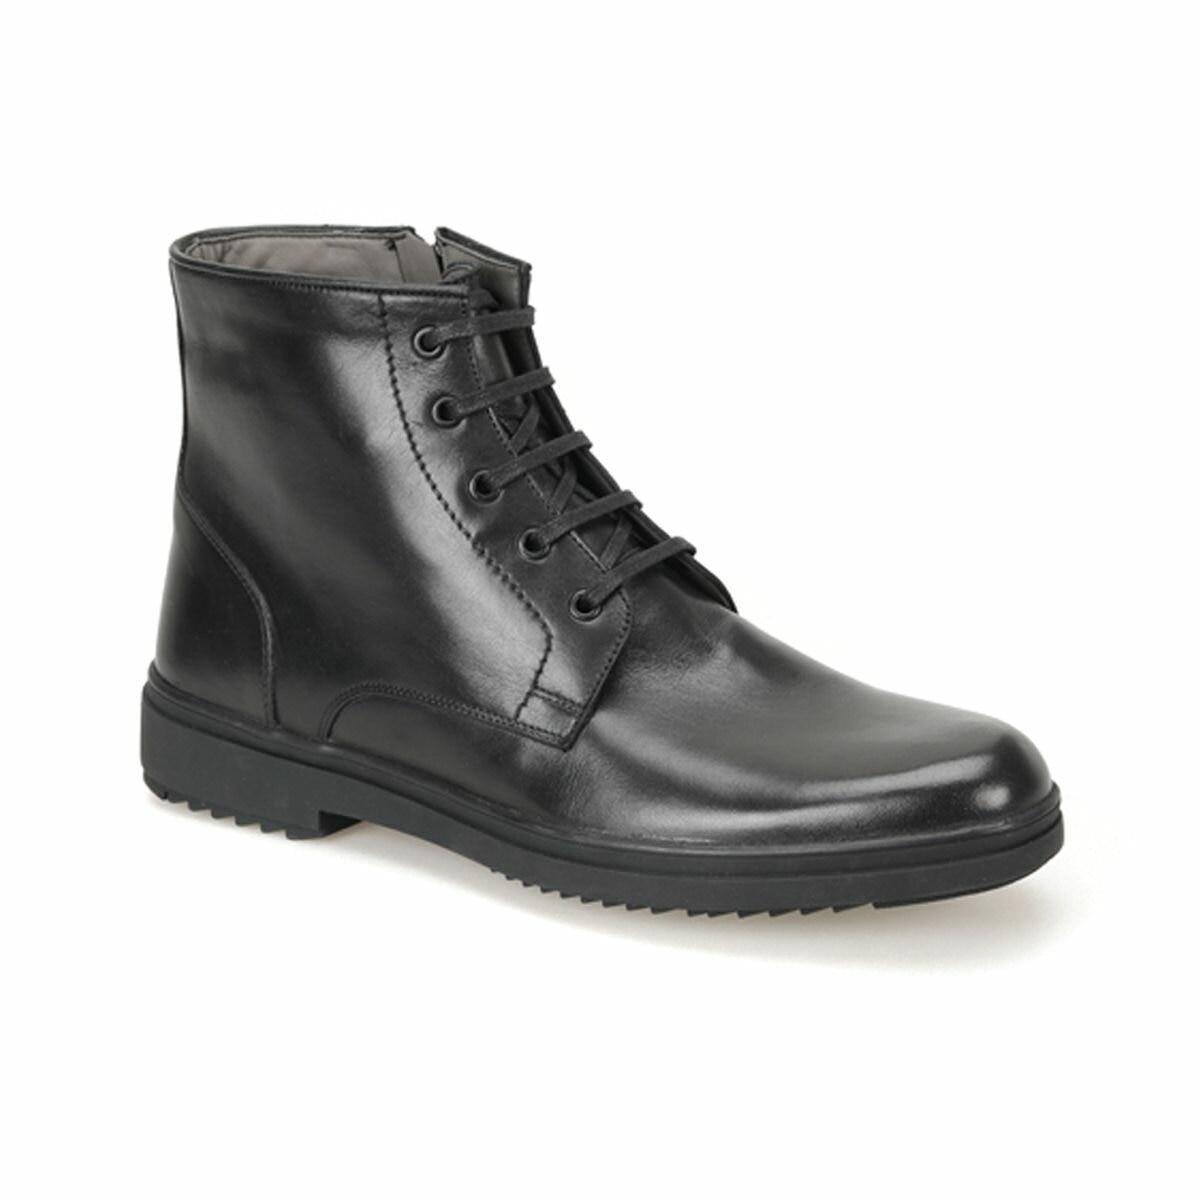 Flo KL-231-2 botas masculinas pretas flogart